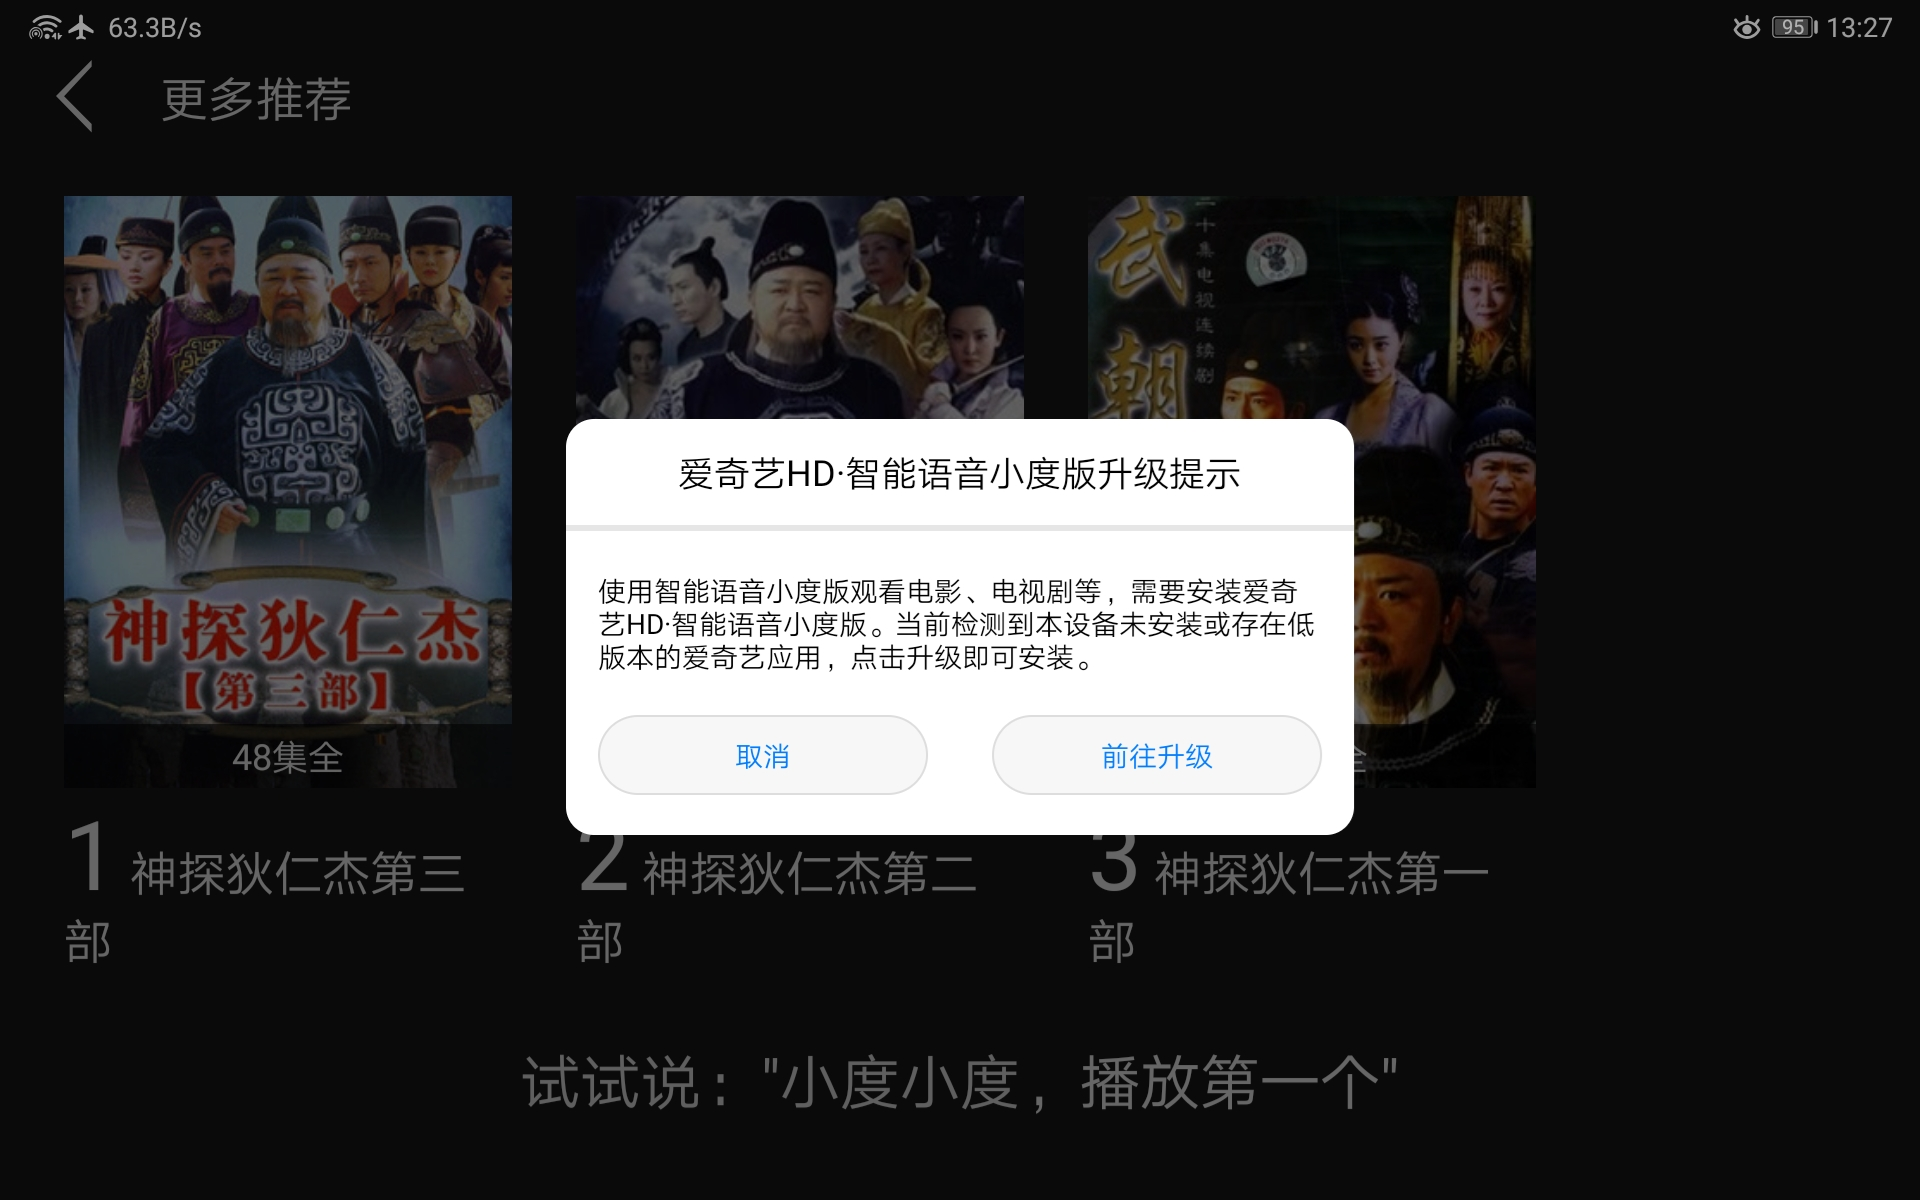 Screenshot_20190414_132706_com.baidu.launcher.jpg